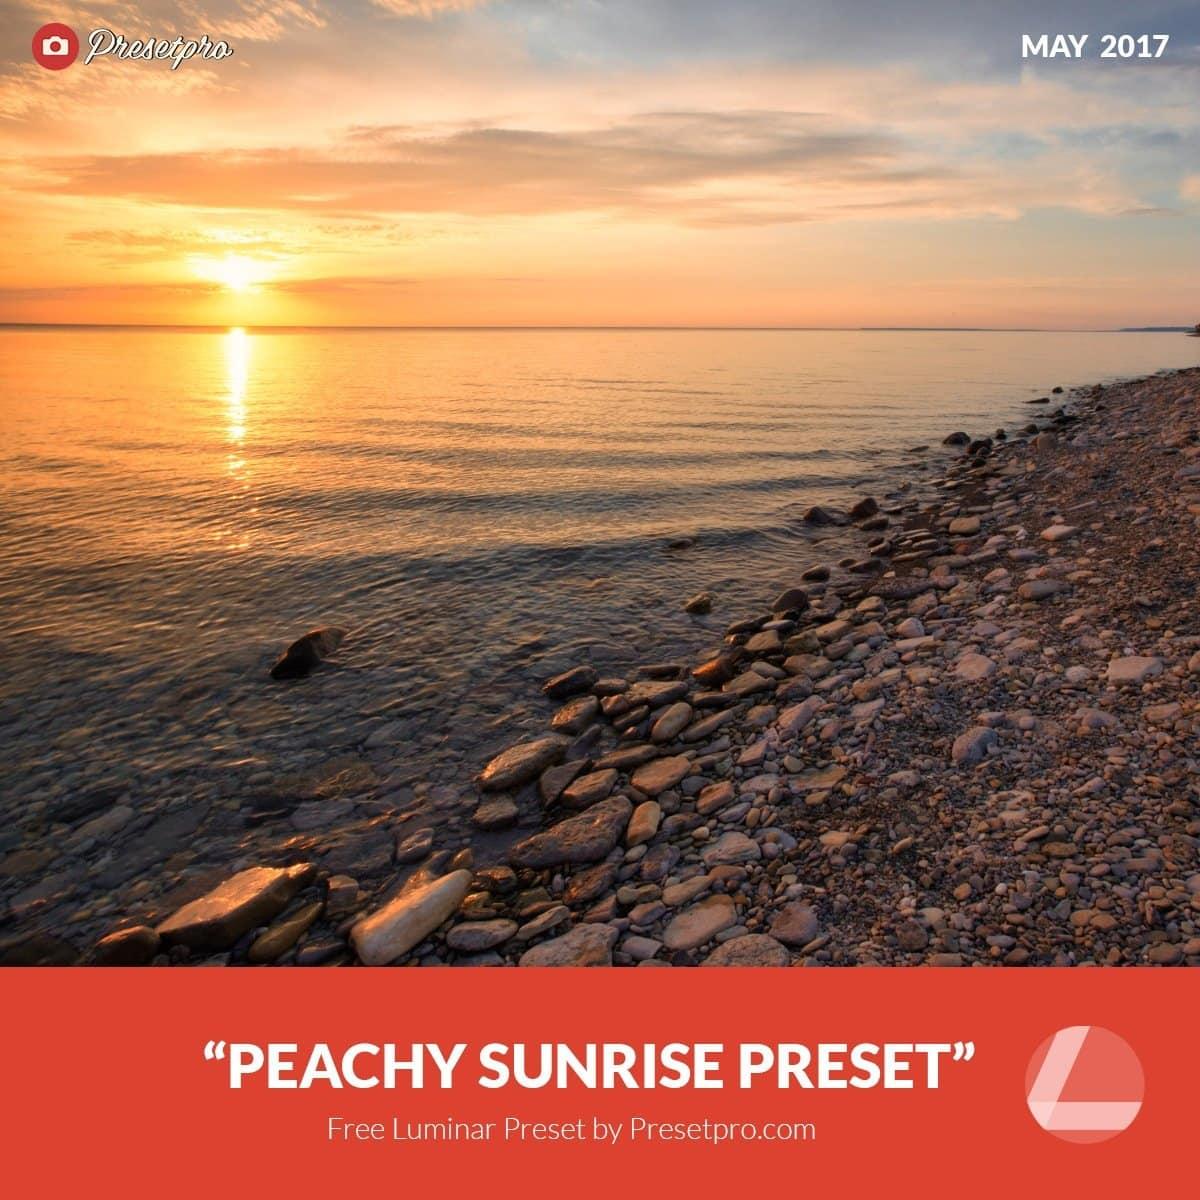 Free-Luminar-Preset-Peachy-Sunrise-Presetpro.com